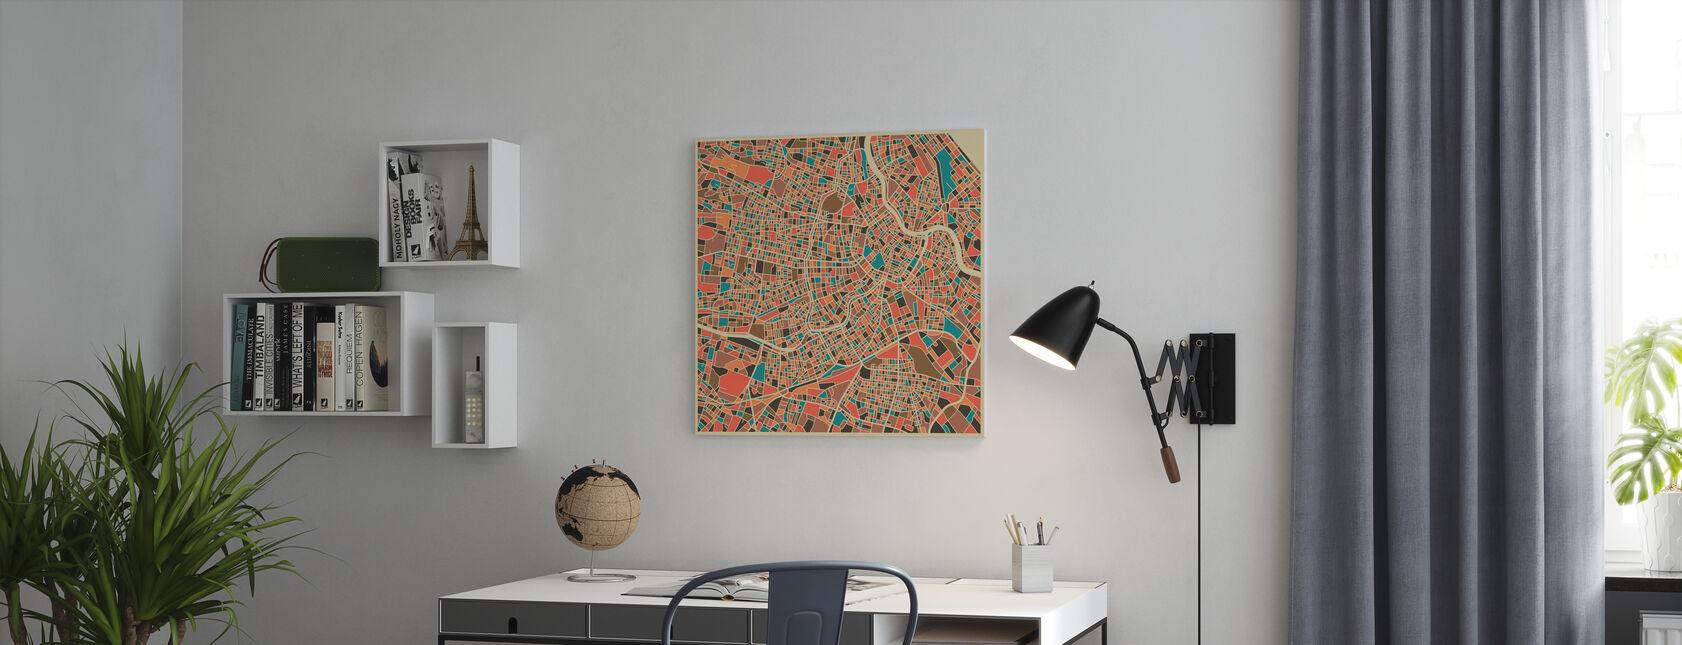 Multicolor Karta - Wien - Canvastavla - Kontor